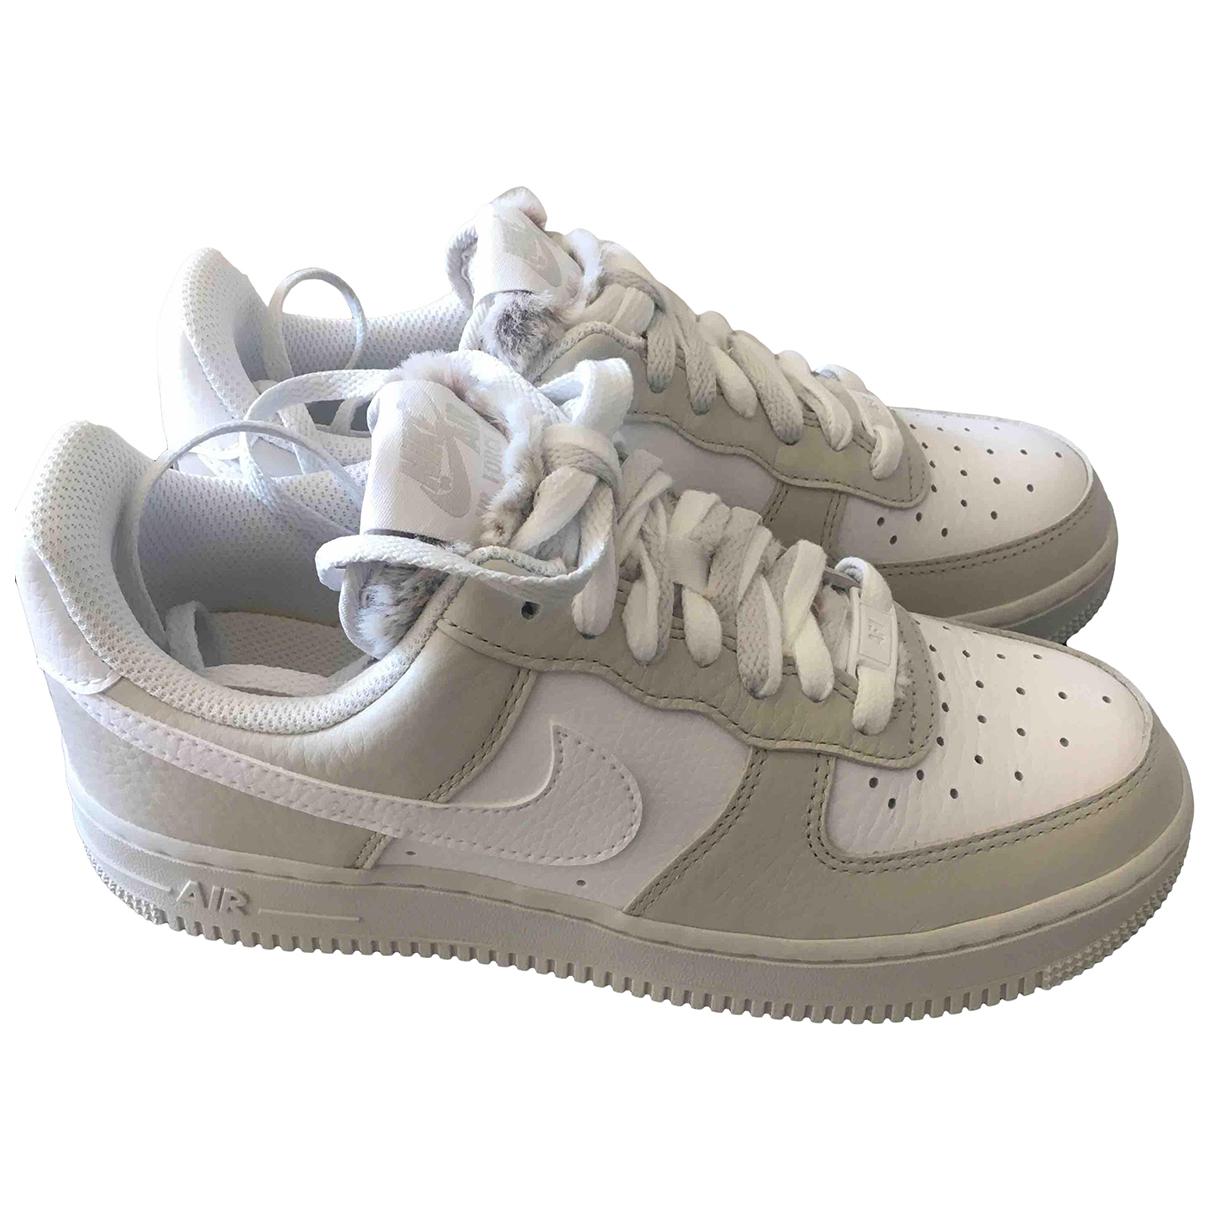 Deportivas Air Force 1 de Pelo sintetico Nike